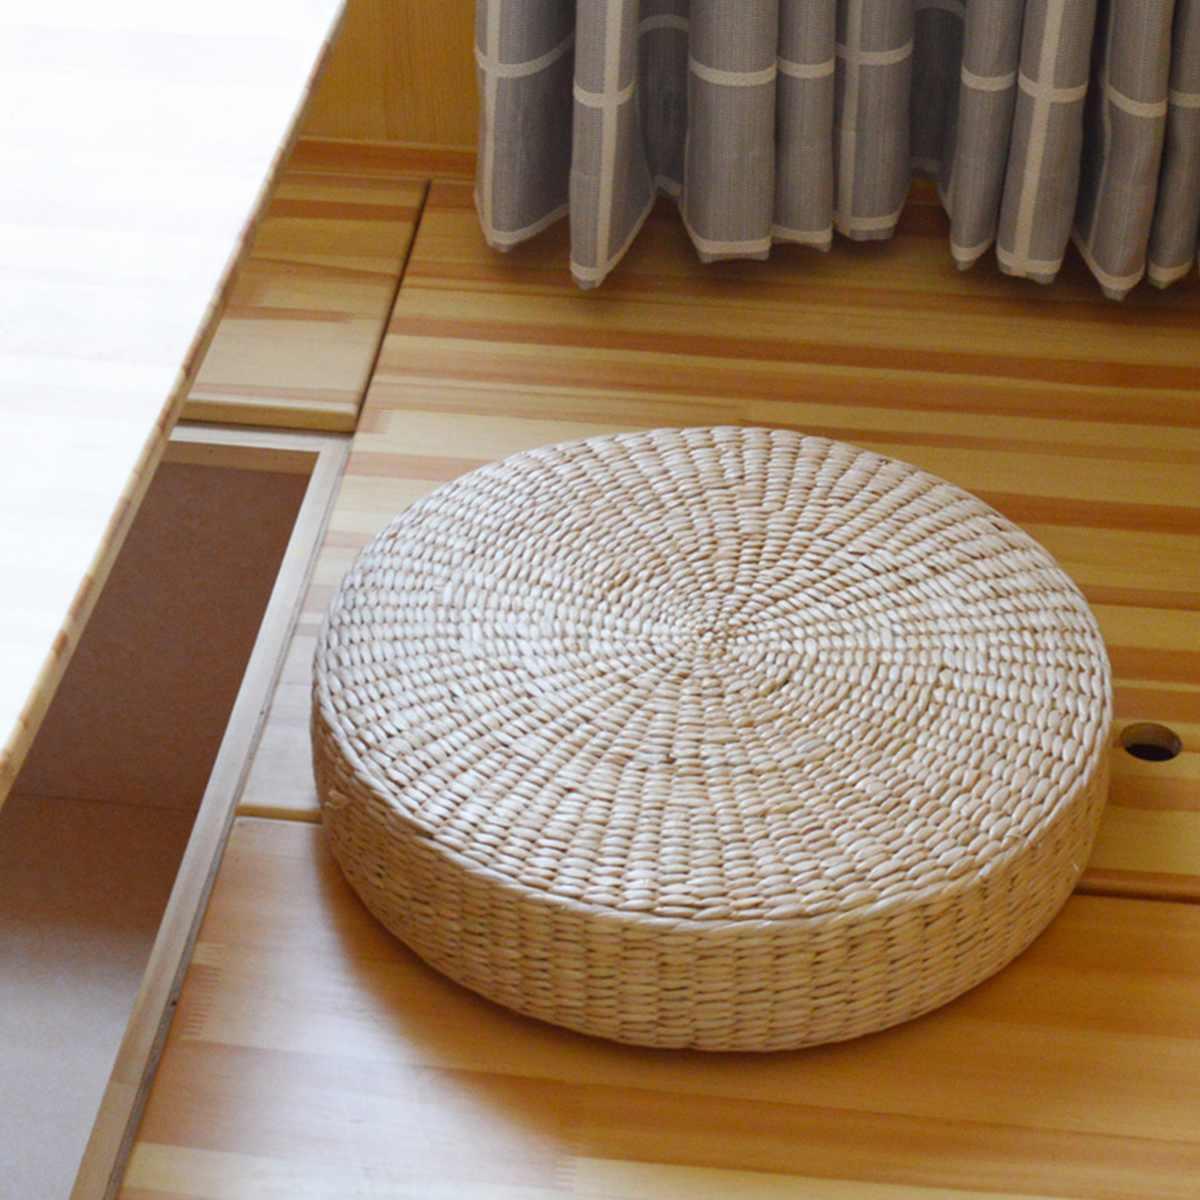 40x7.5cm 자연 짚 직조 라운드 Pouf 다다미 쿠션 바닥 쿠션 명상 요가 라운드 매트 홈 침실 의자 쿠션